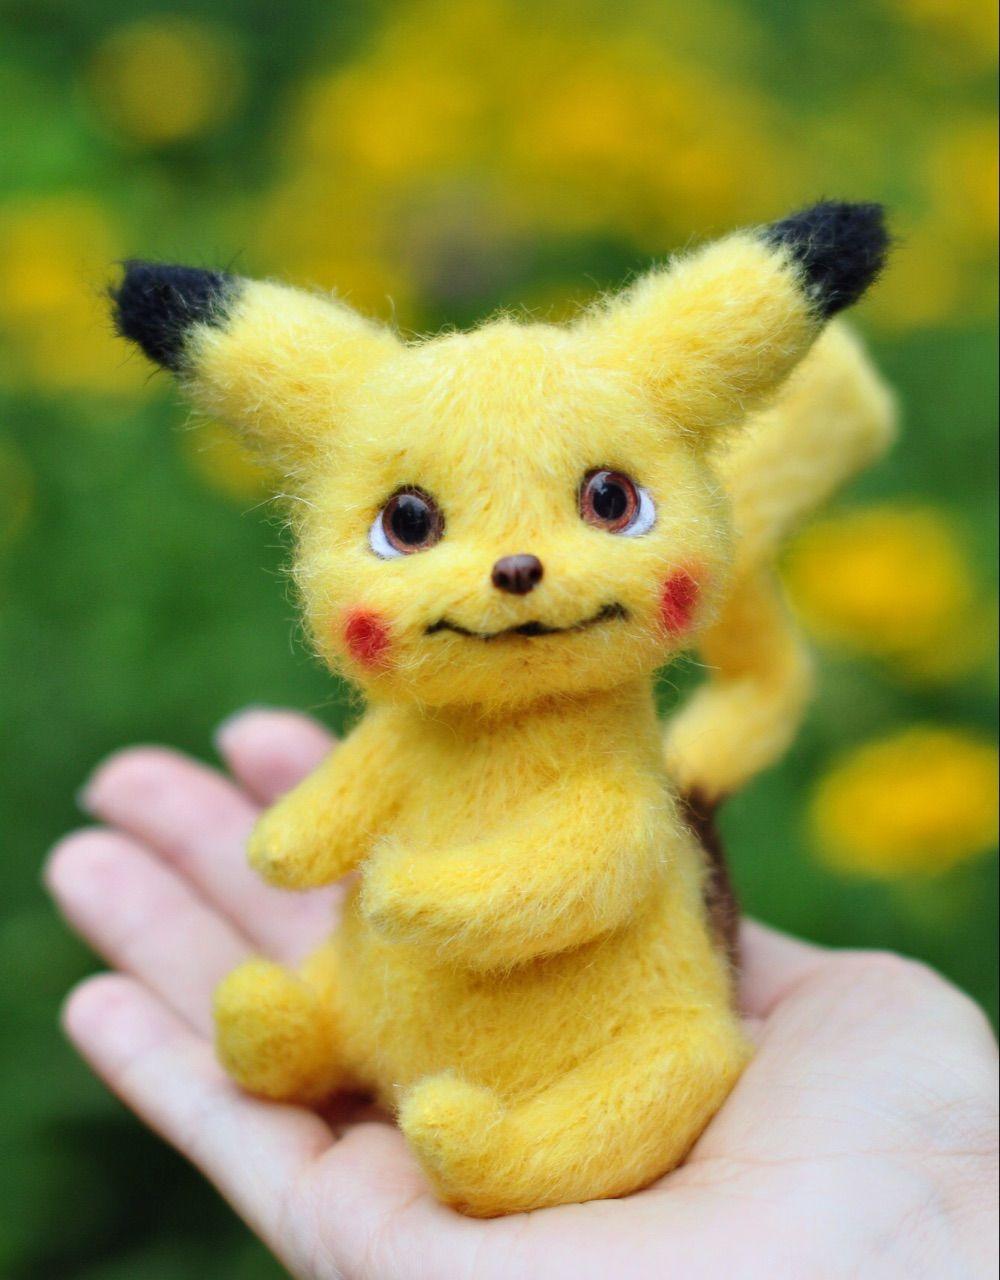 Crochet Pikachu from Pokemon, Plush Pokemon Pikachu toy, Detective Pikachu stuff toy #dollsneedlefelt